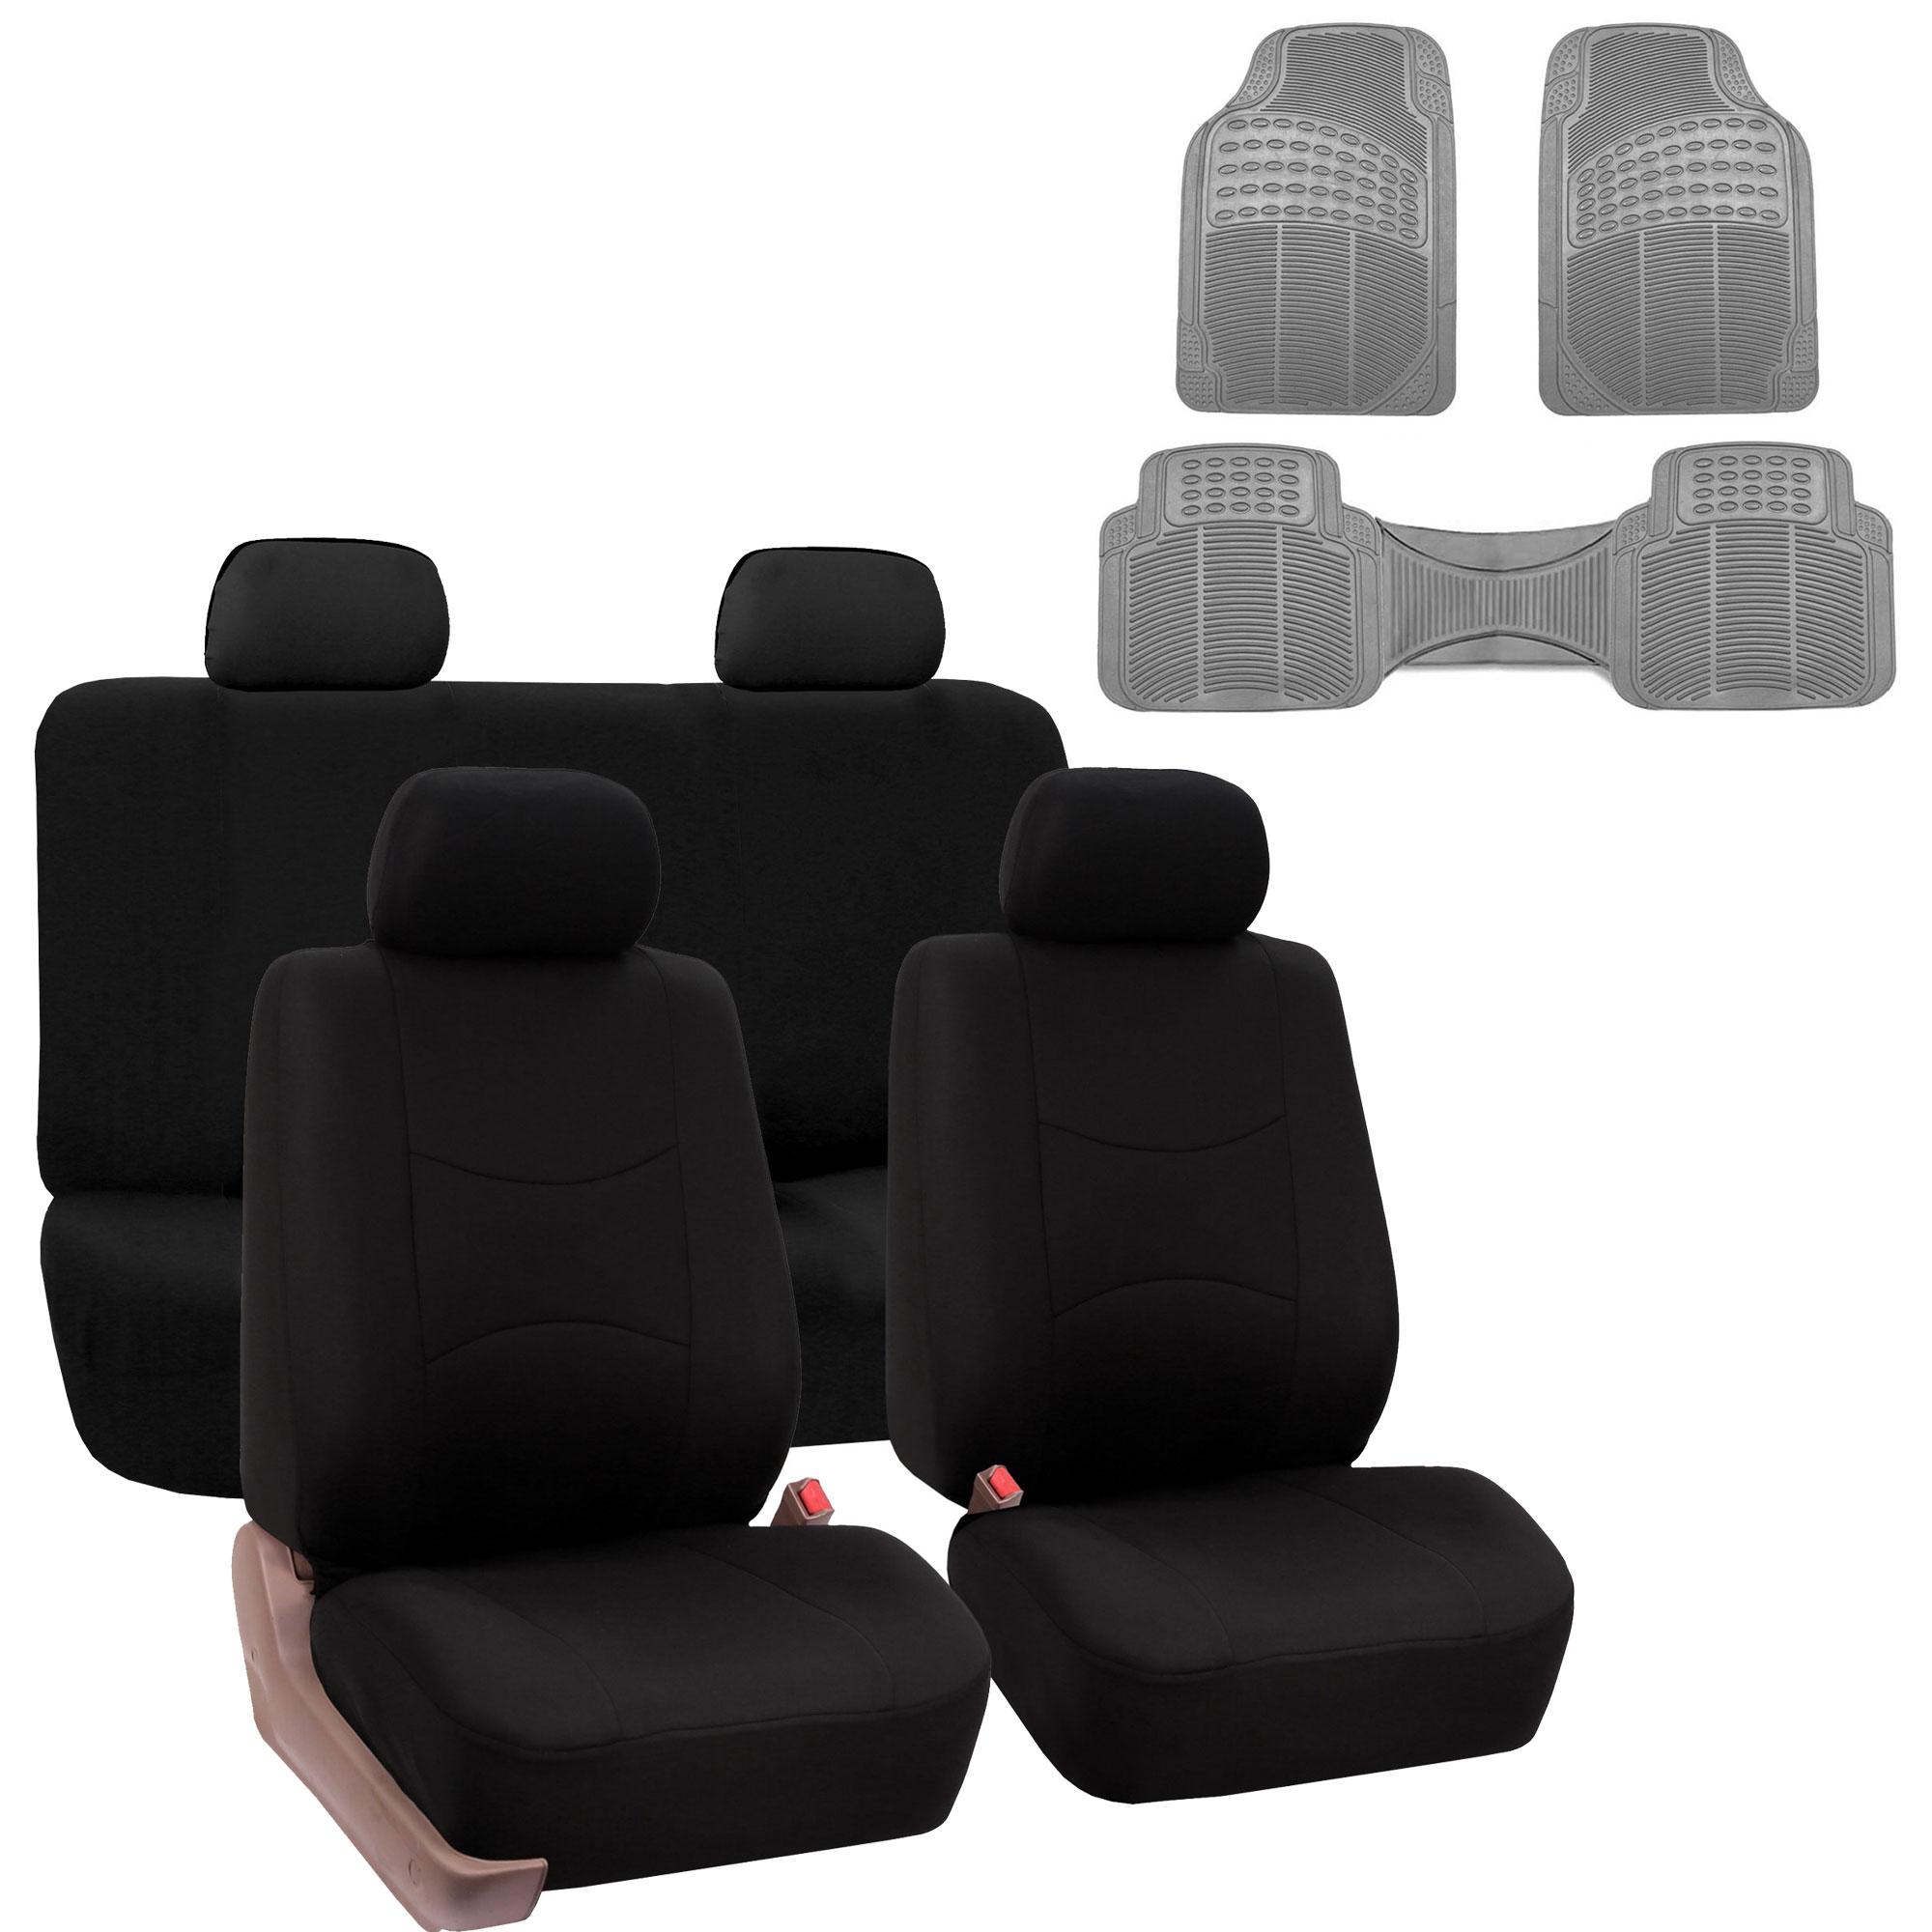 Car Seat Cover Full Set For For Auto Car SUV Truck Van w/ Floor Mat Black